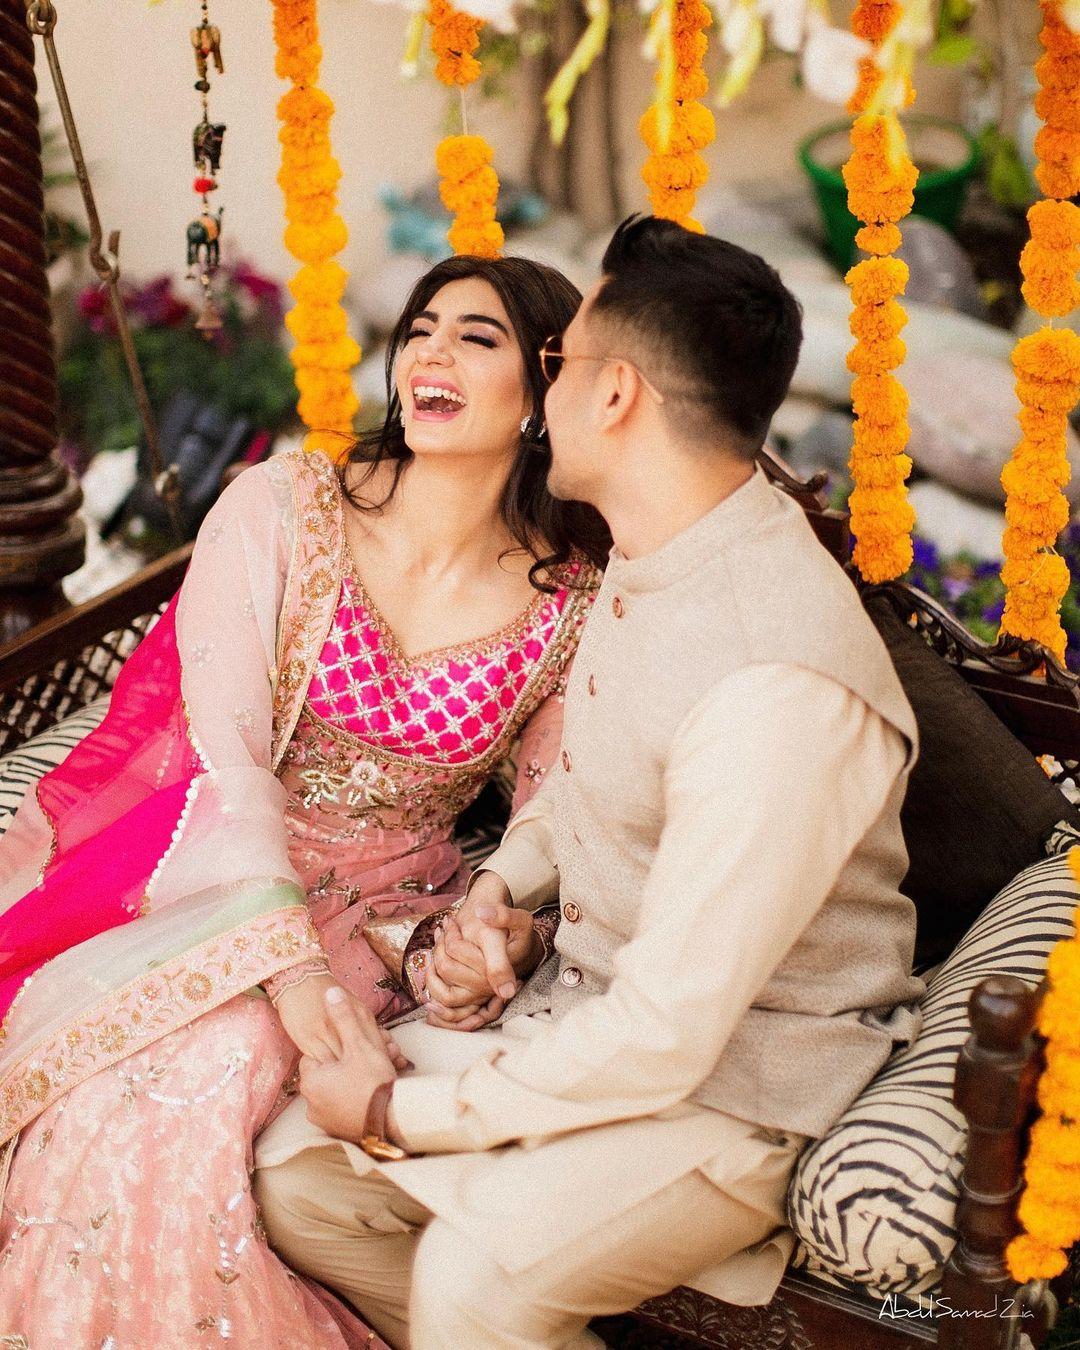 Mariam Ansari and Owais Khan Mehndi - Beautiful HD Pictures